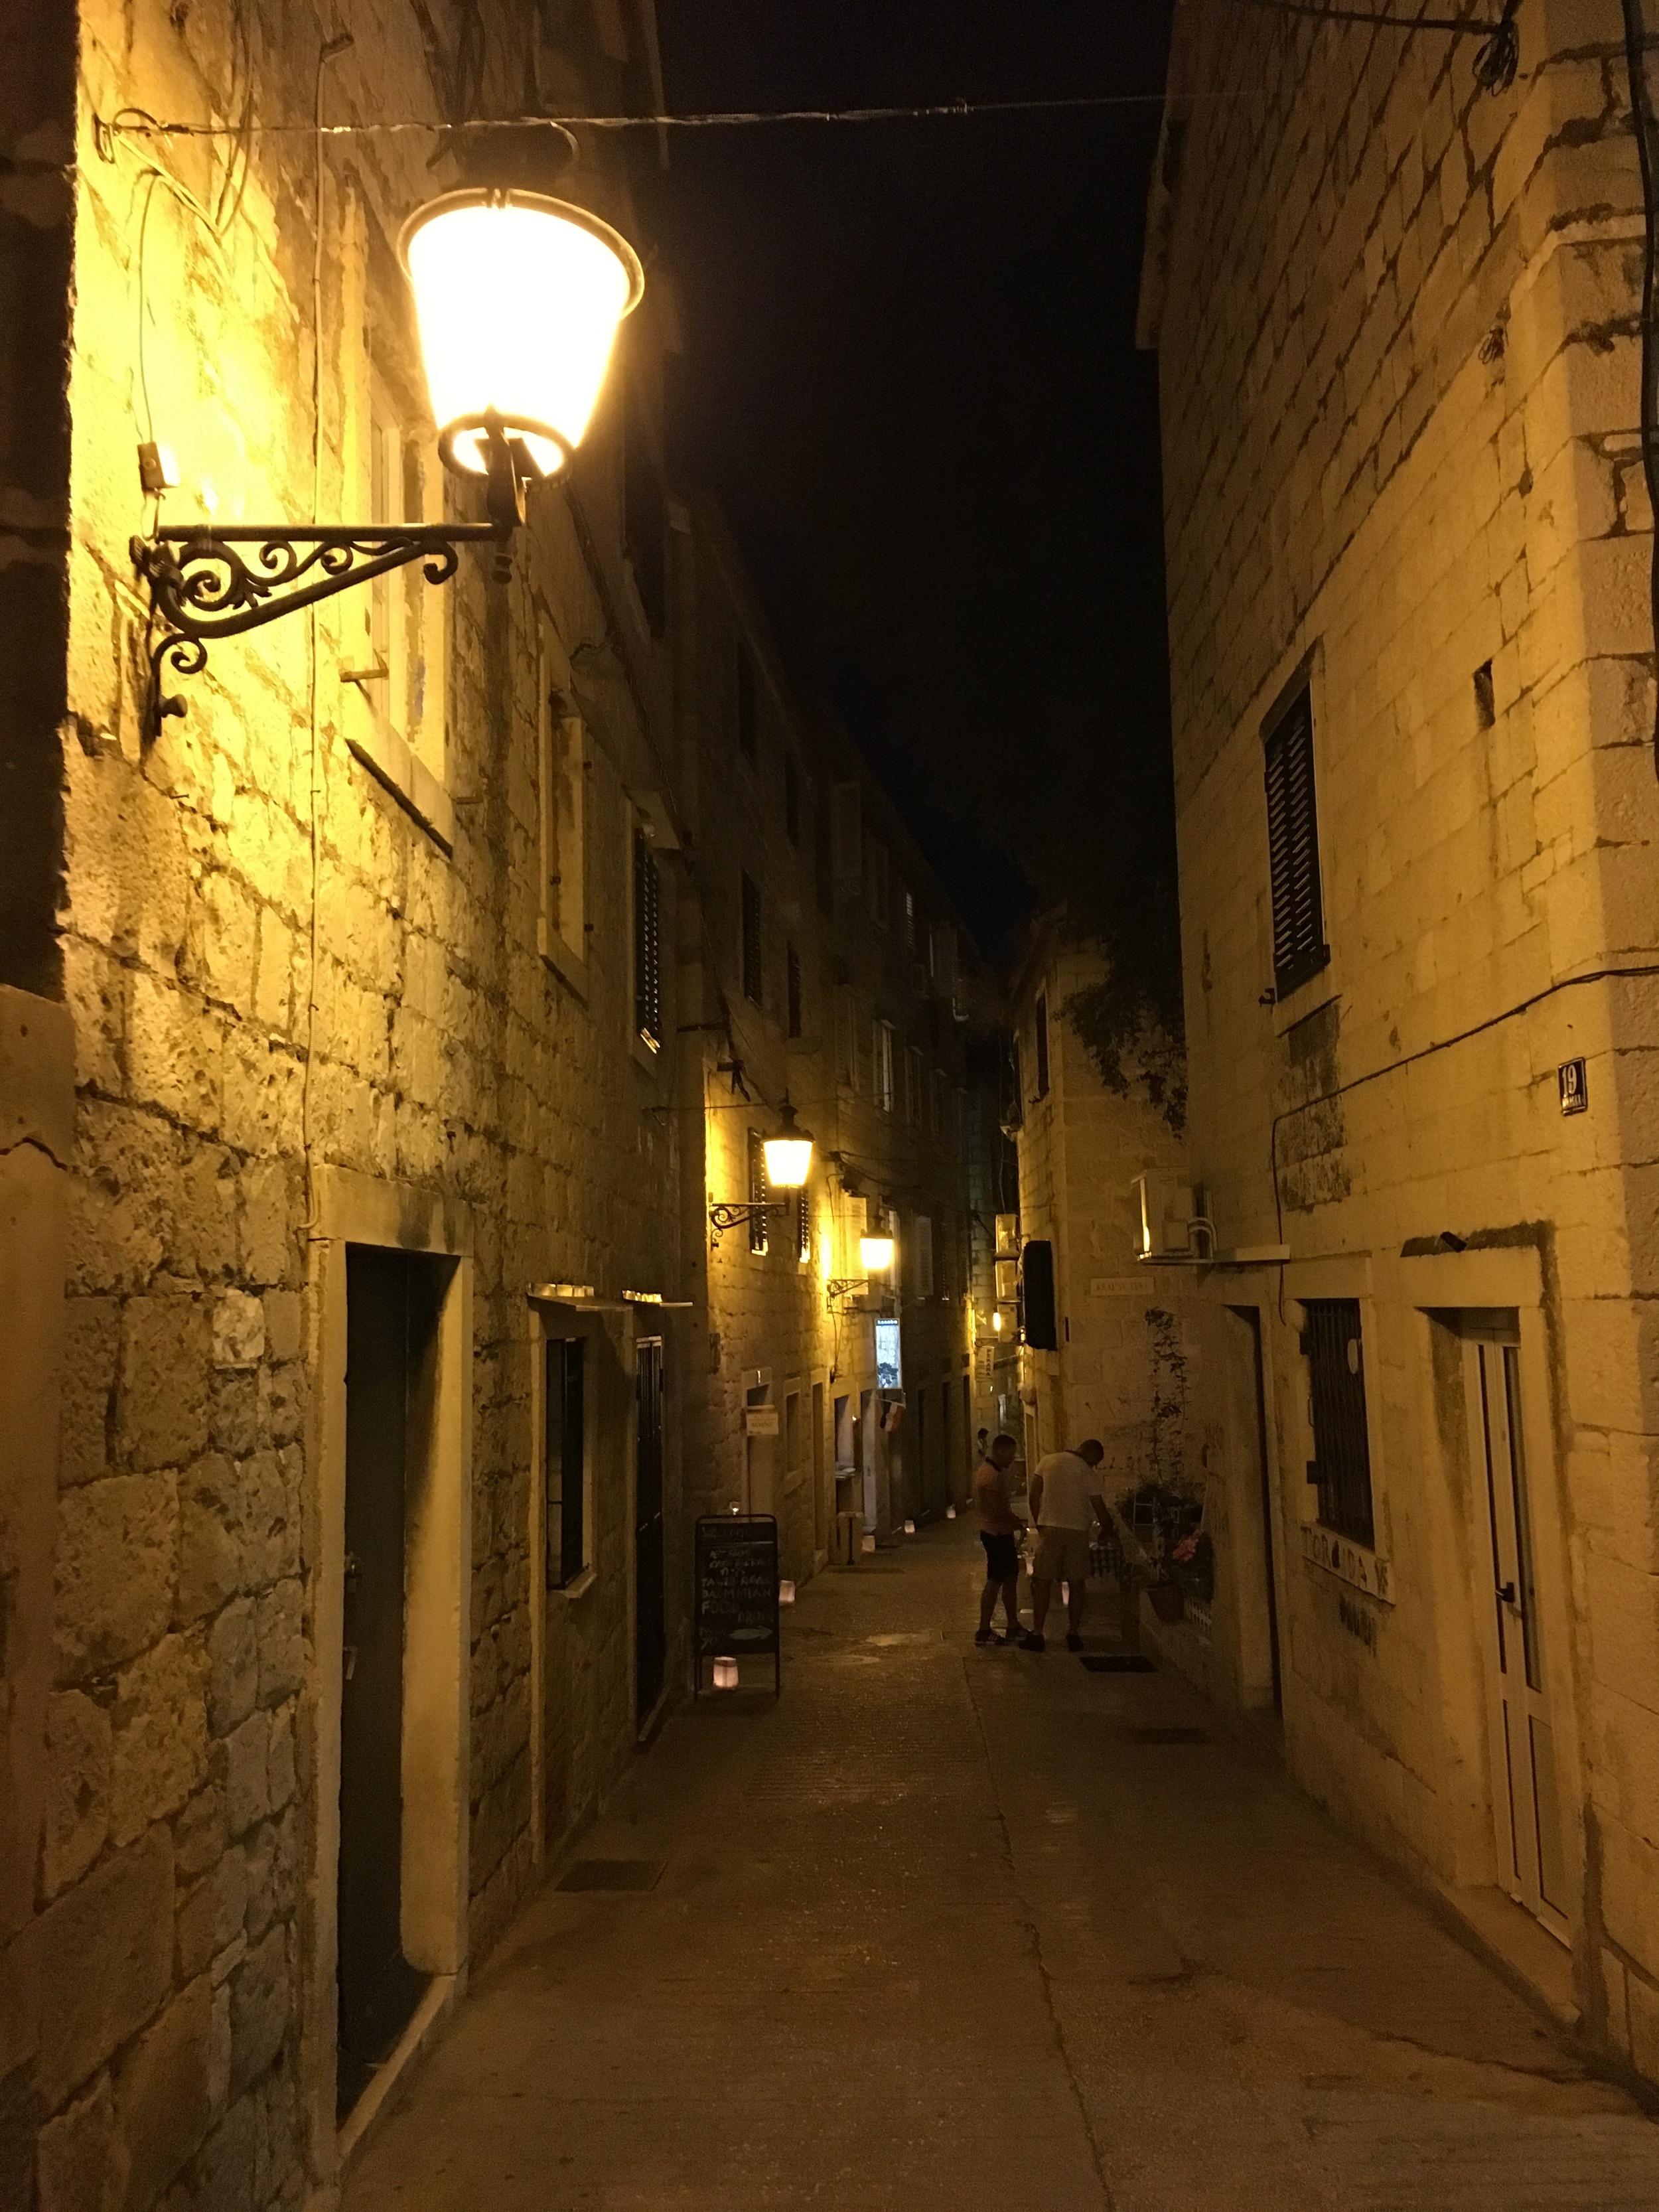 Evening walk through the narrow streets.